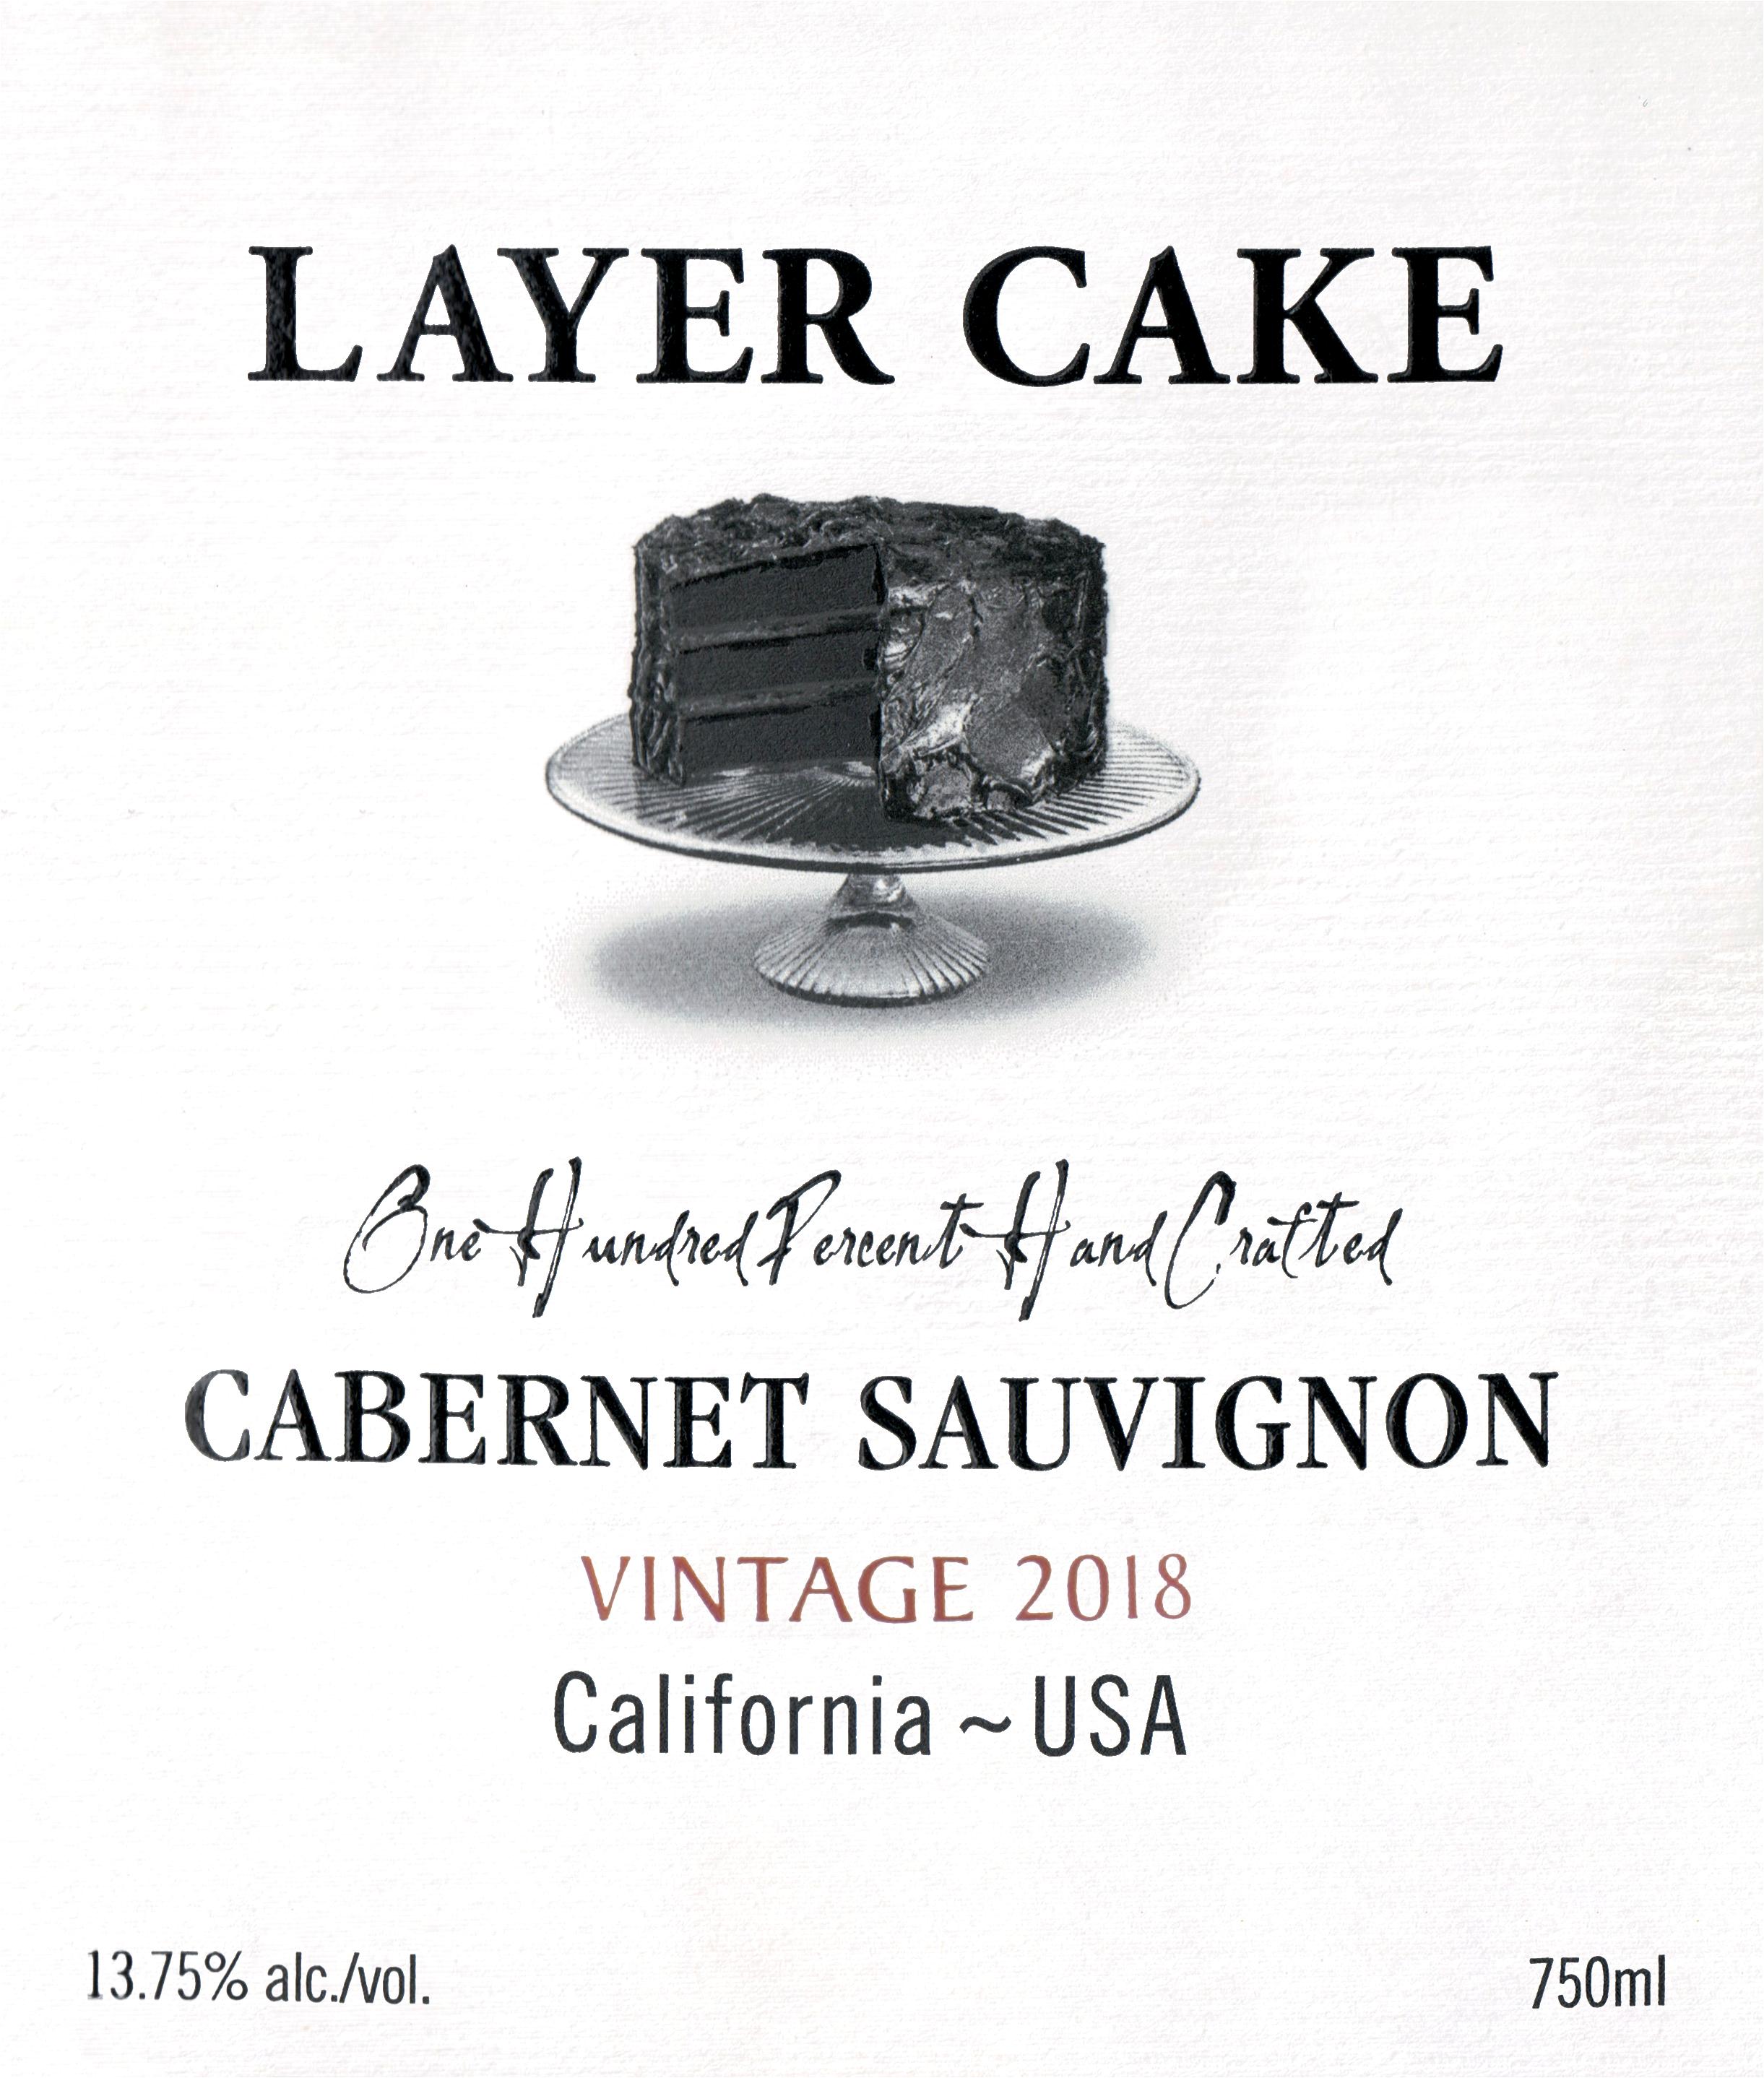 Layer Cake Cabernet Sauvignon 2018